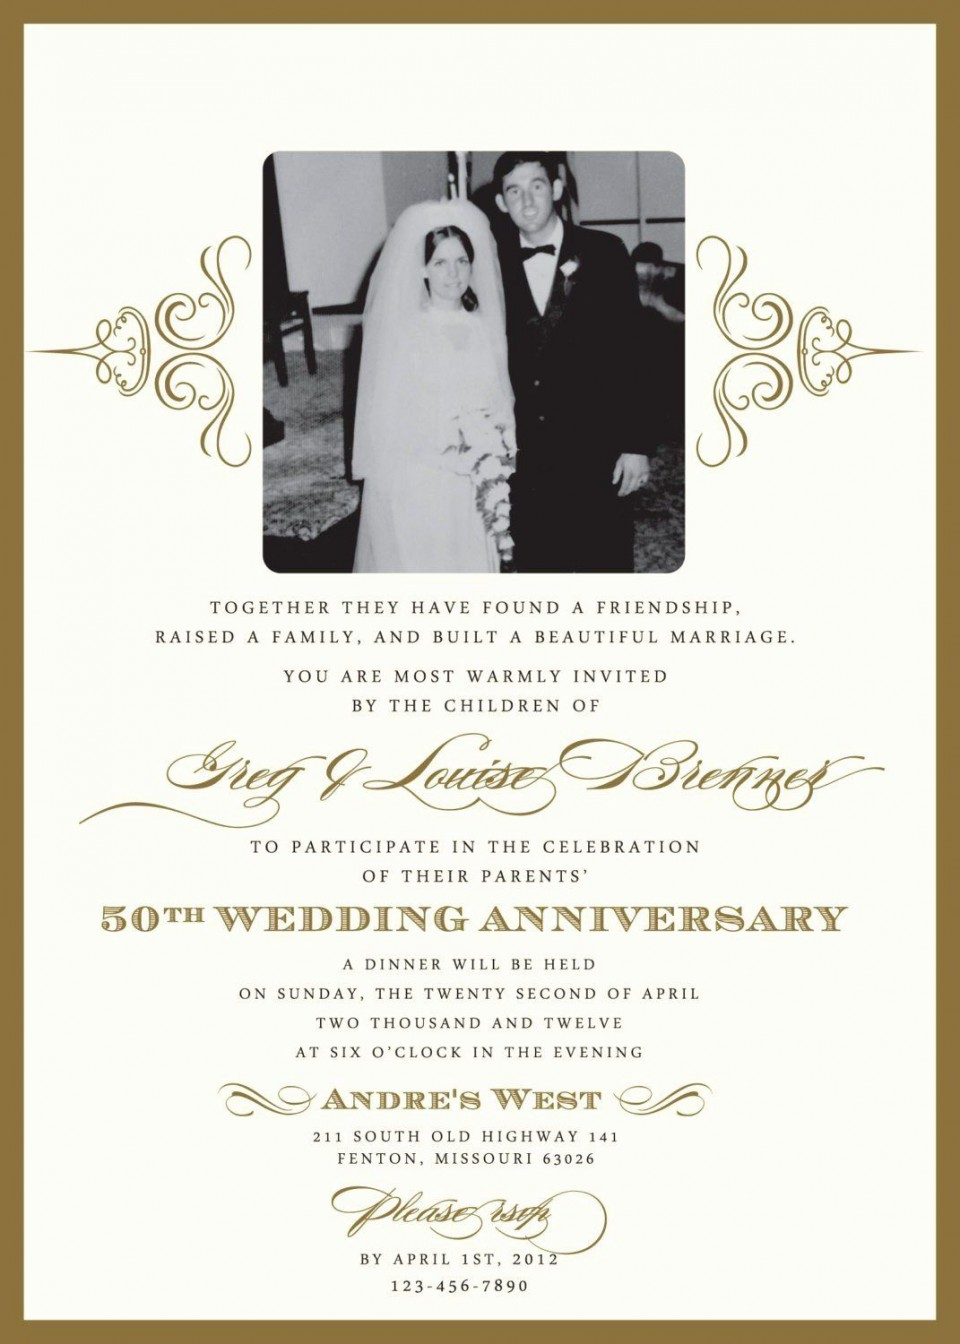 003 Sensational 50th Anniversary Party Invitation Template Photo  Wedding Free Download Microsoft Word960